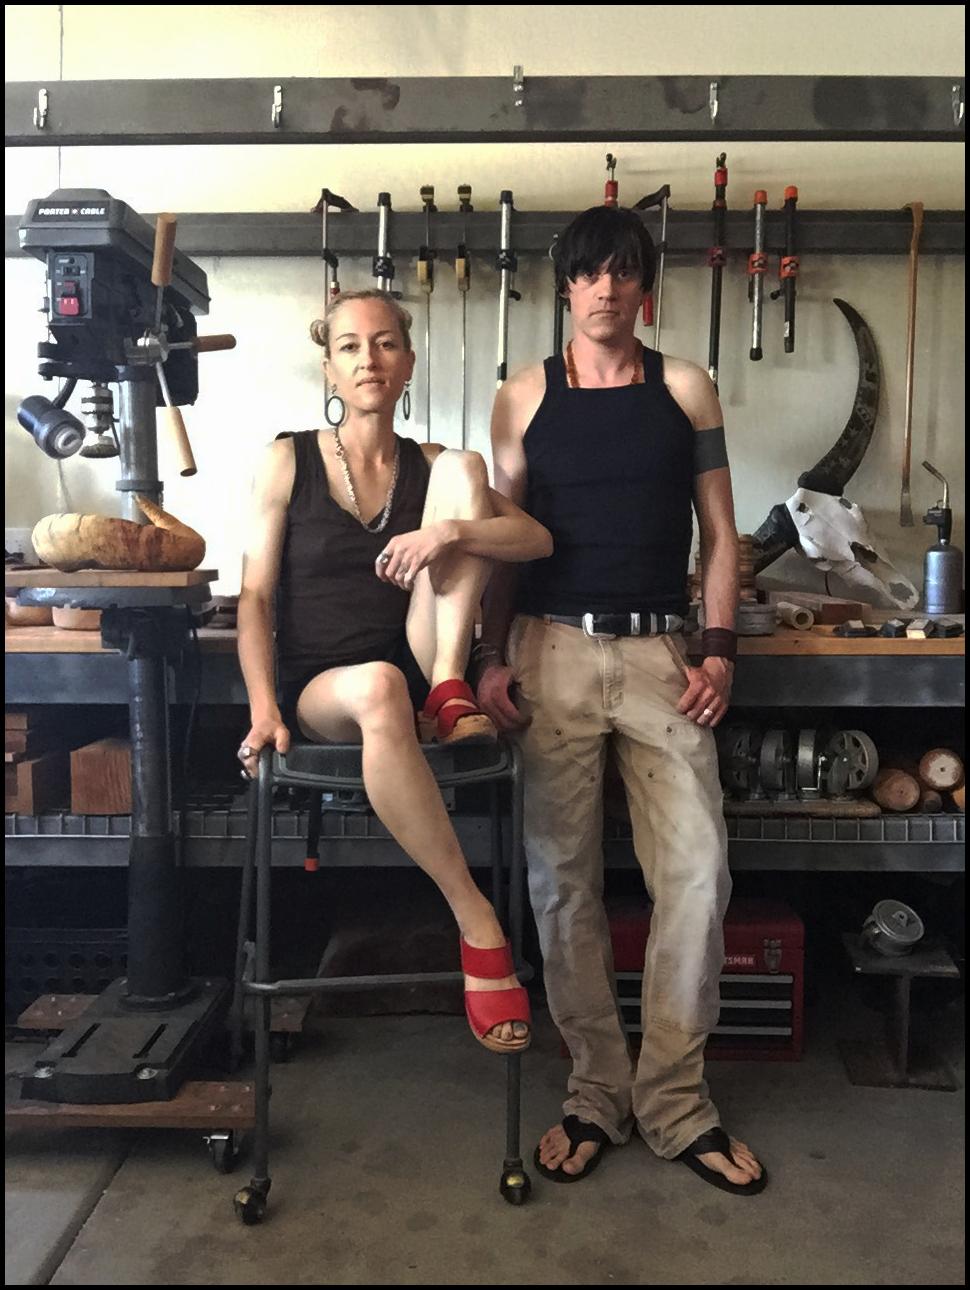 NONA AND CYRUS CORON